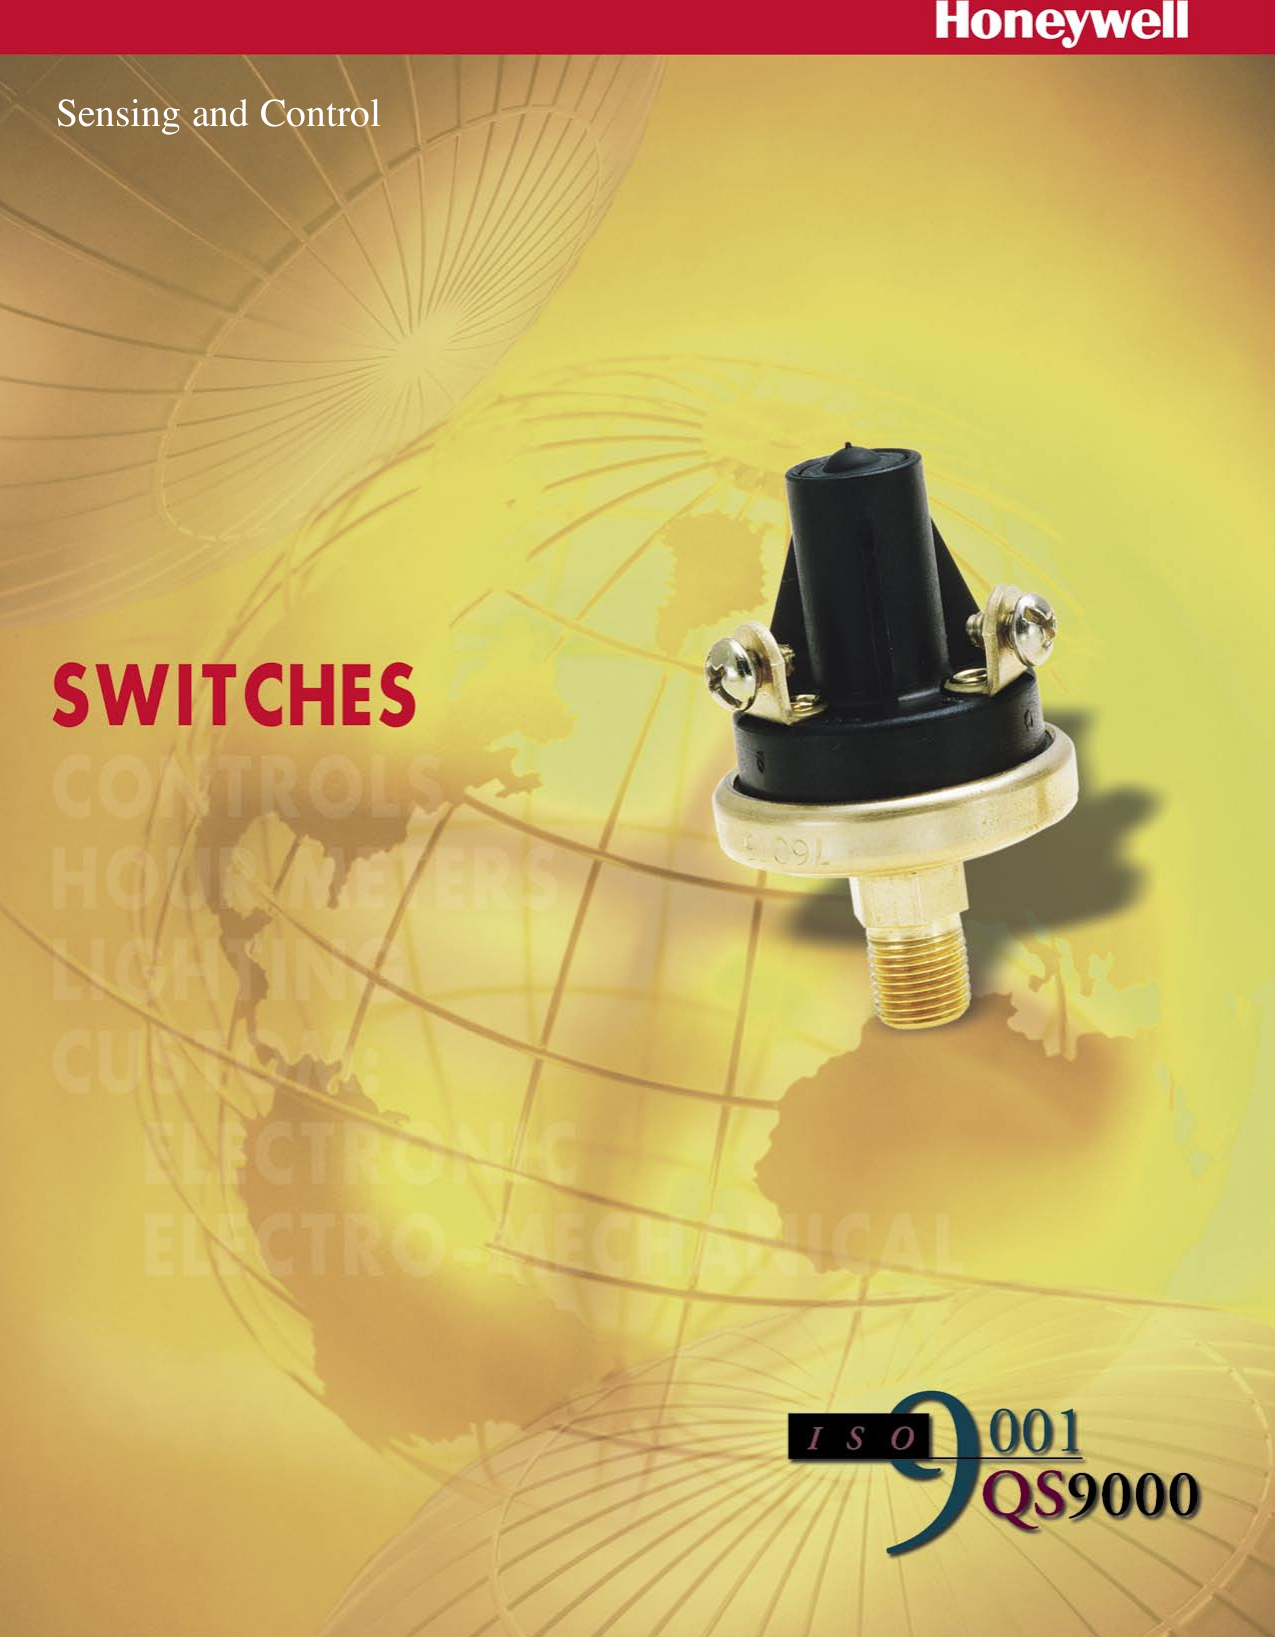 Presur Swtch Spst-Nc Stndrd 3.1 to 7 Psi